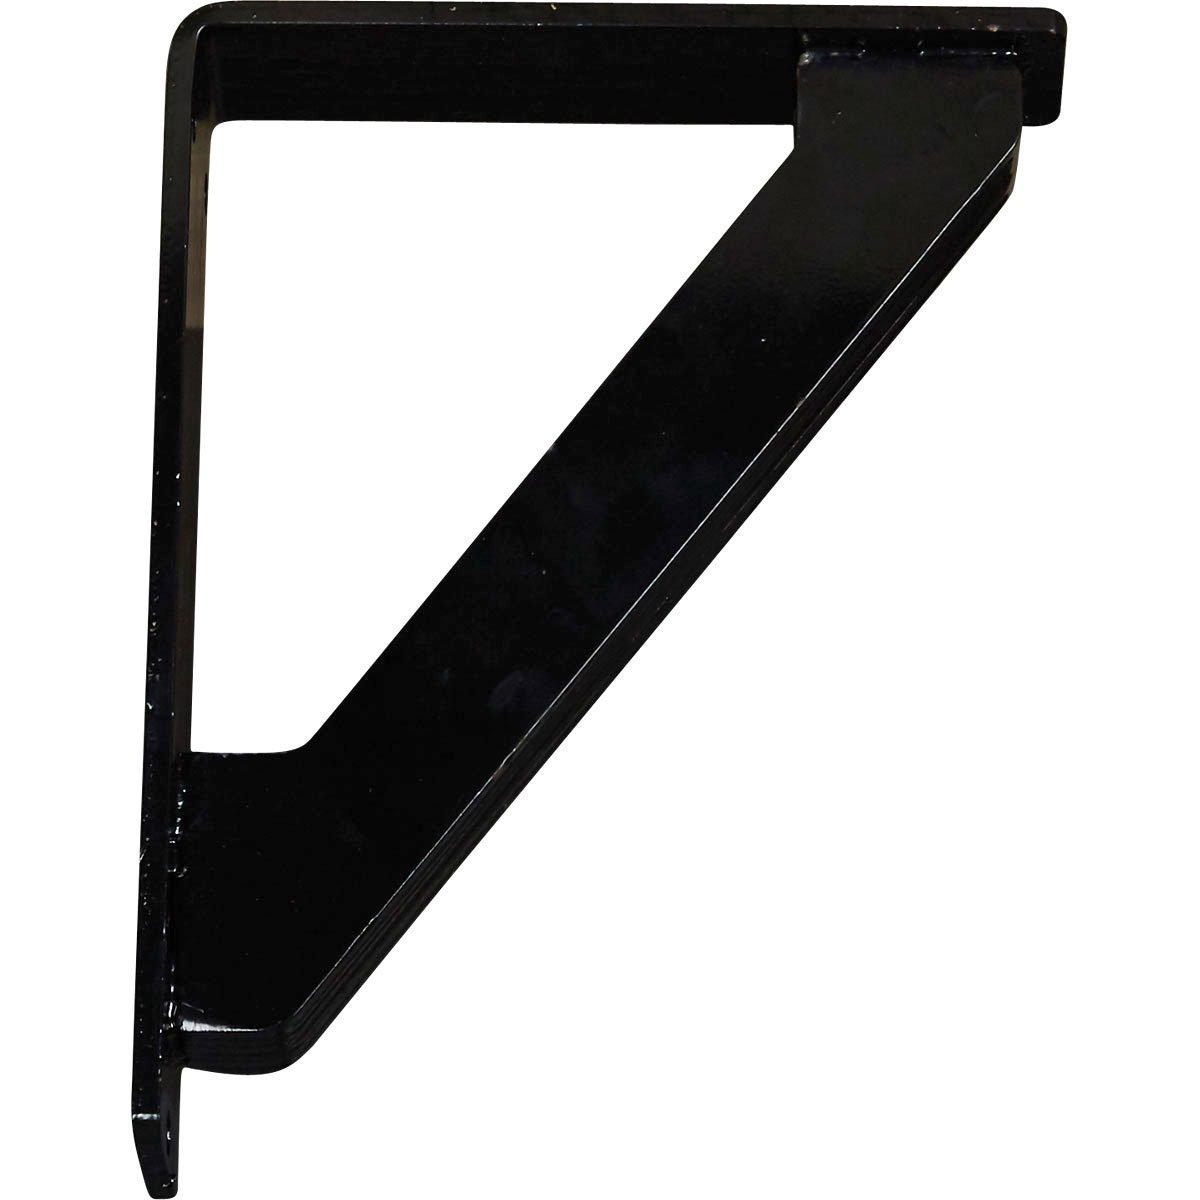 3 Length 3//8 Height 3//8 Width Micro 100 GS-090002 Brazed Groove Tool Square Shank DiameterStyle GS 0.090//0.092 Width 0.300 Length 0.003 maximum Radius